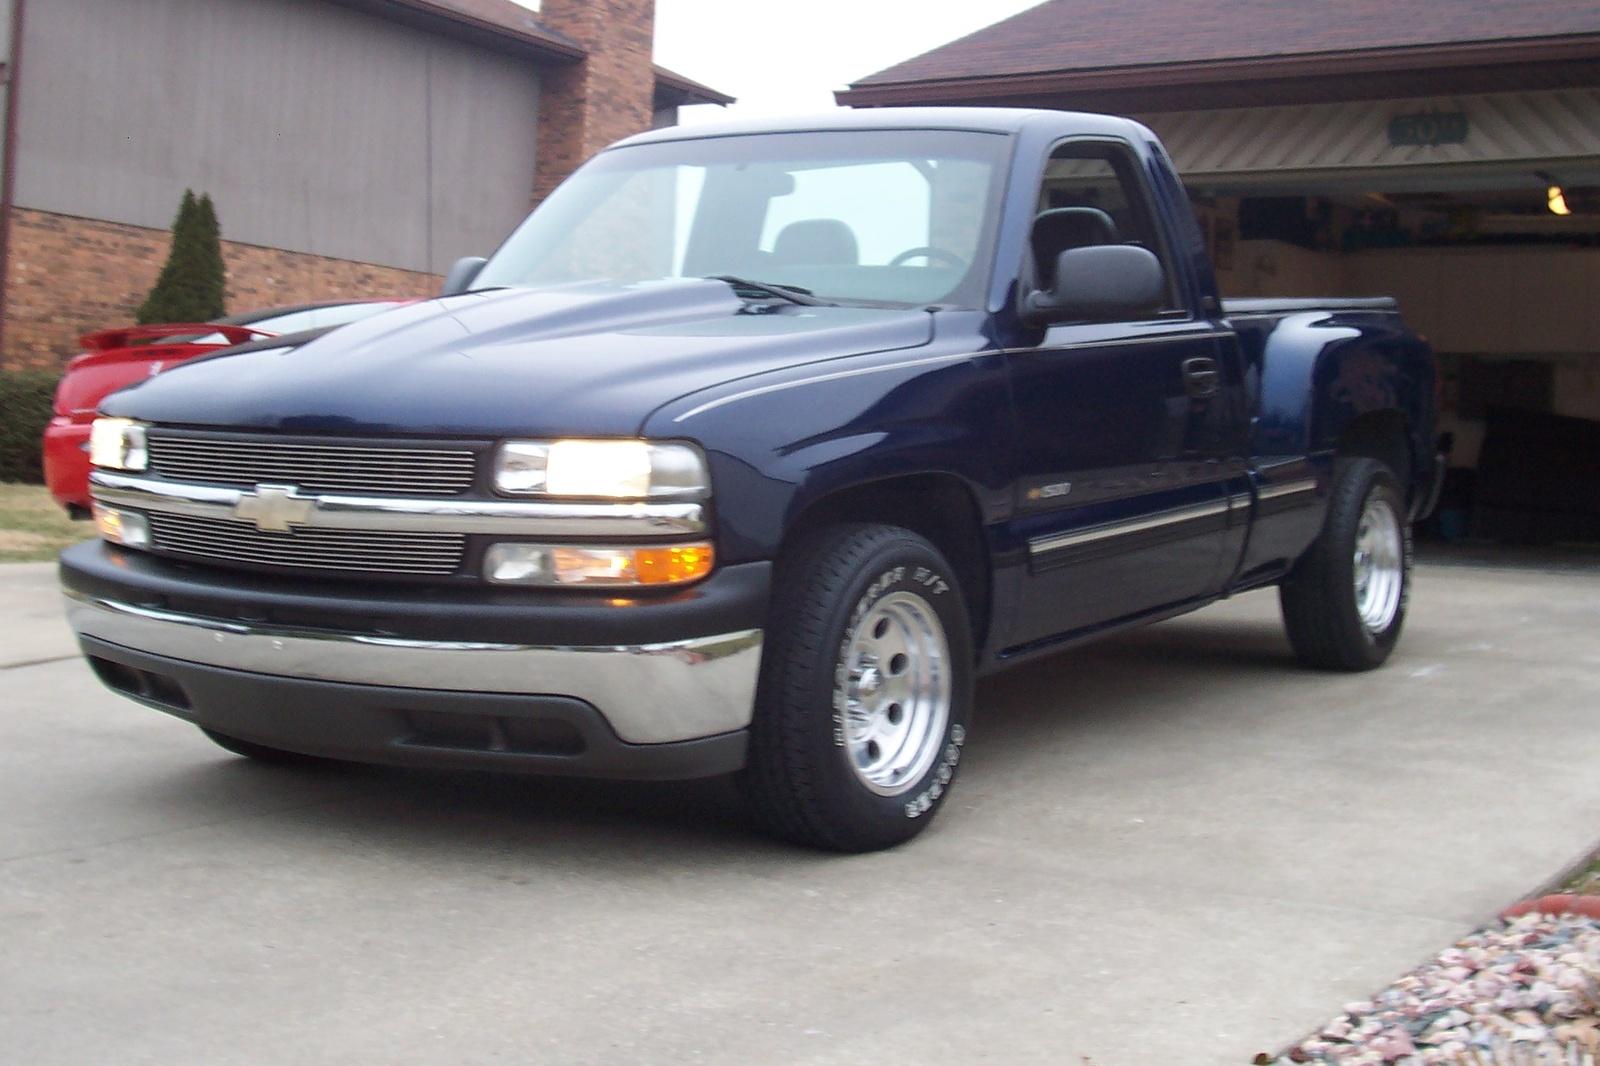 Chevrolet Silverado 1500 Stepside Picture 8 Reviews